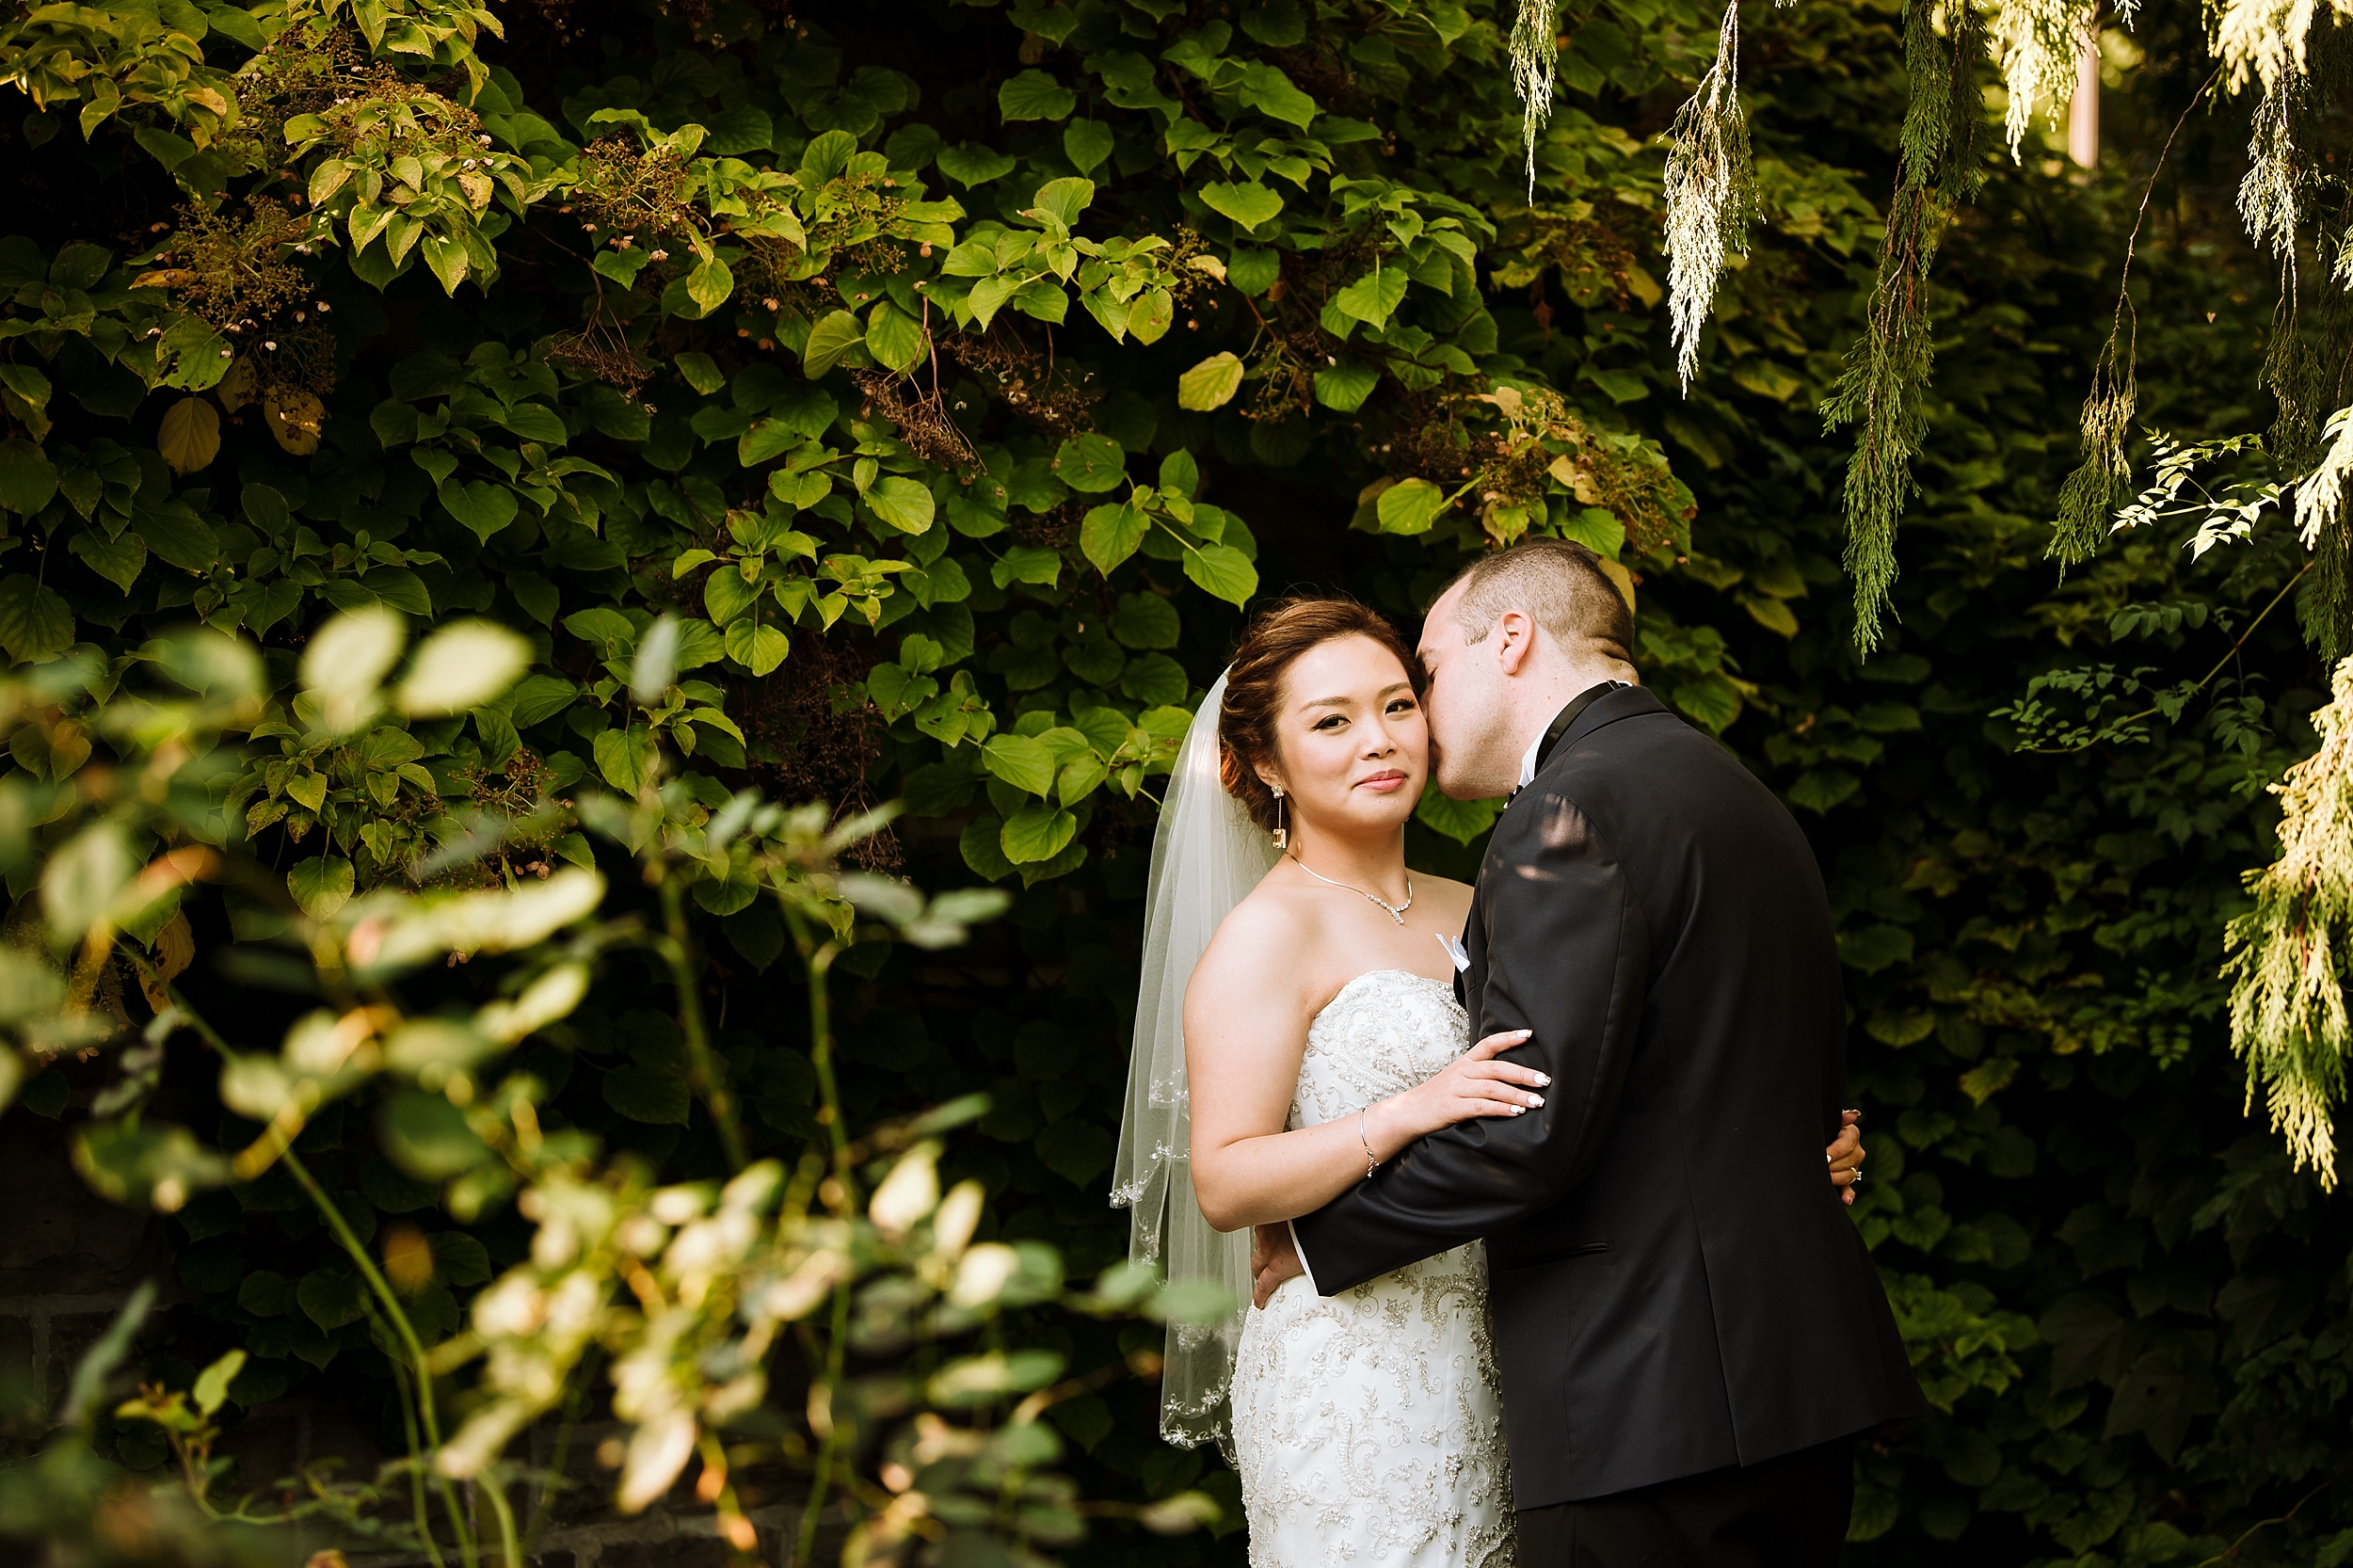 Sunnybrook_Estates_Alexander_Muir_Toronto_Wedding_Photographer_0026.jpg